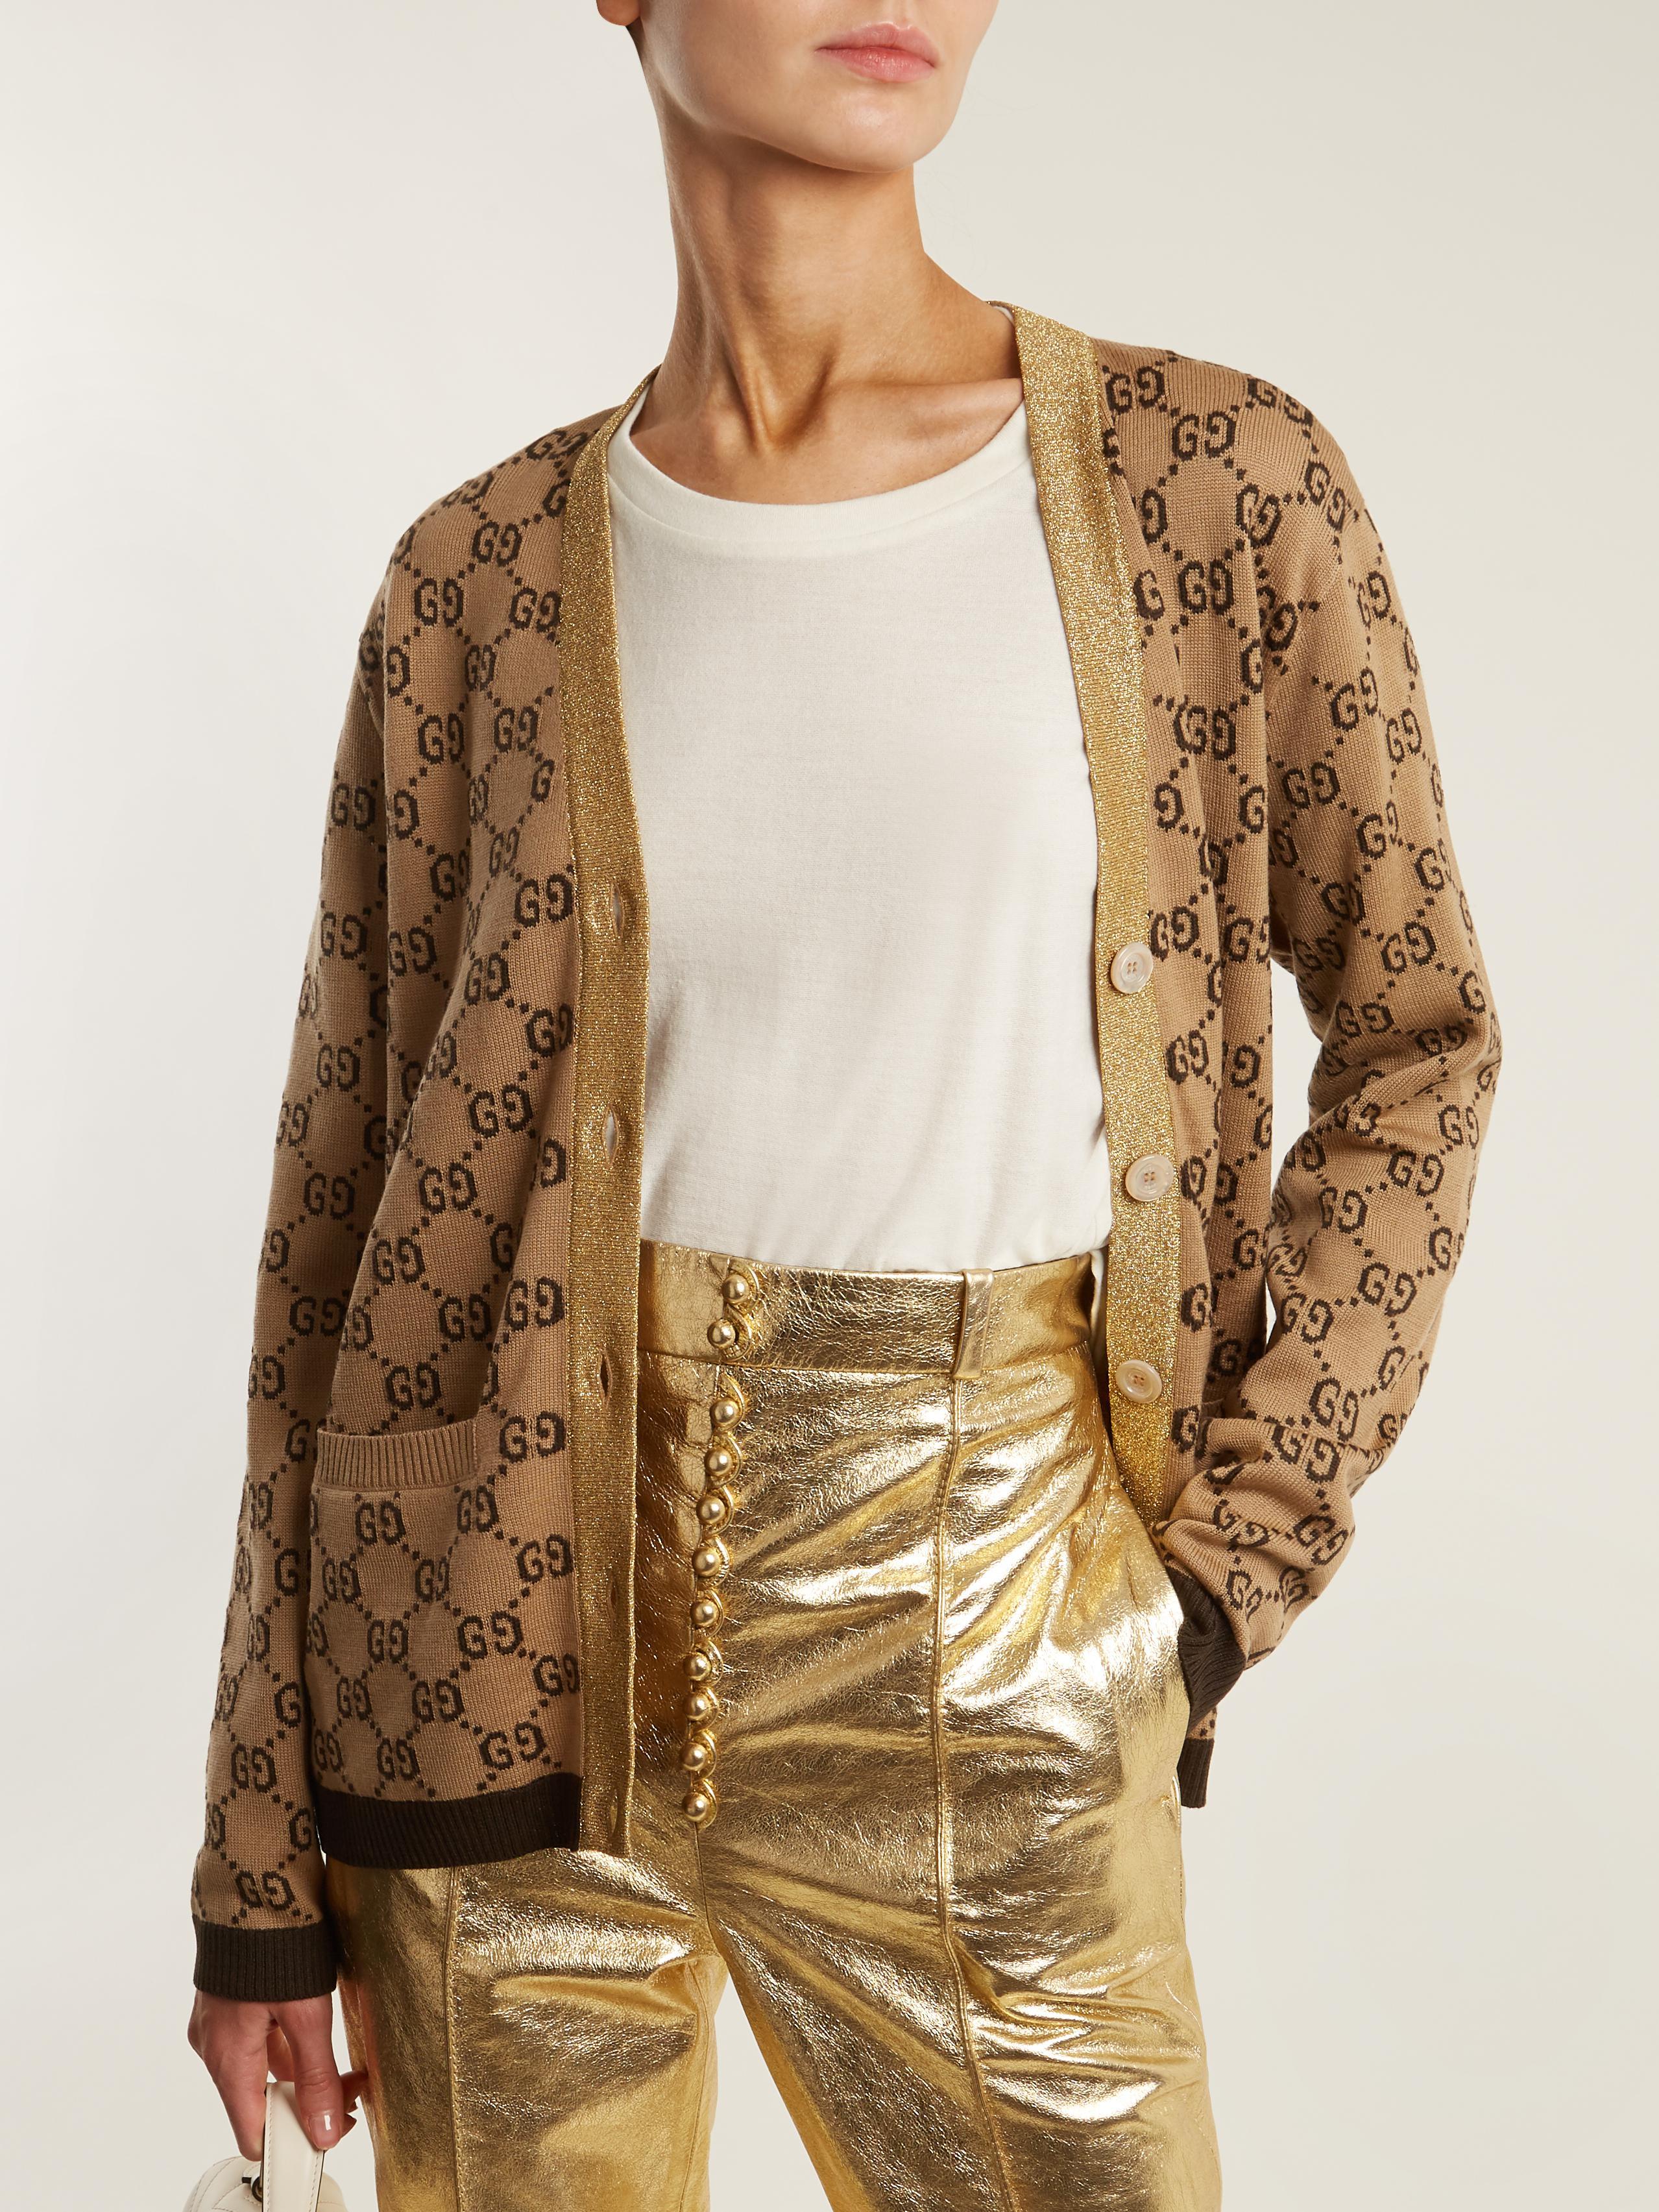 4894f1762 Gucci Gg-jacquard Wool Cardigan in Natural - Lyst